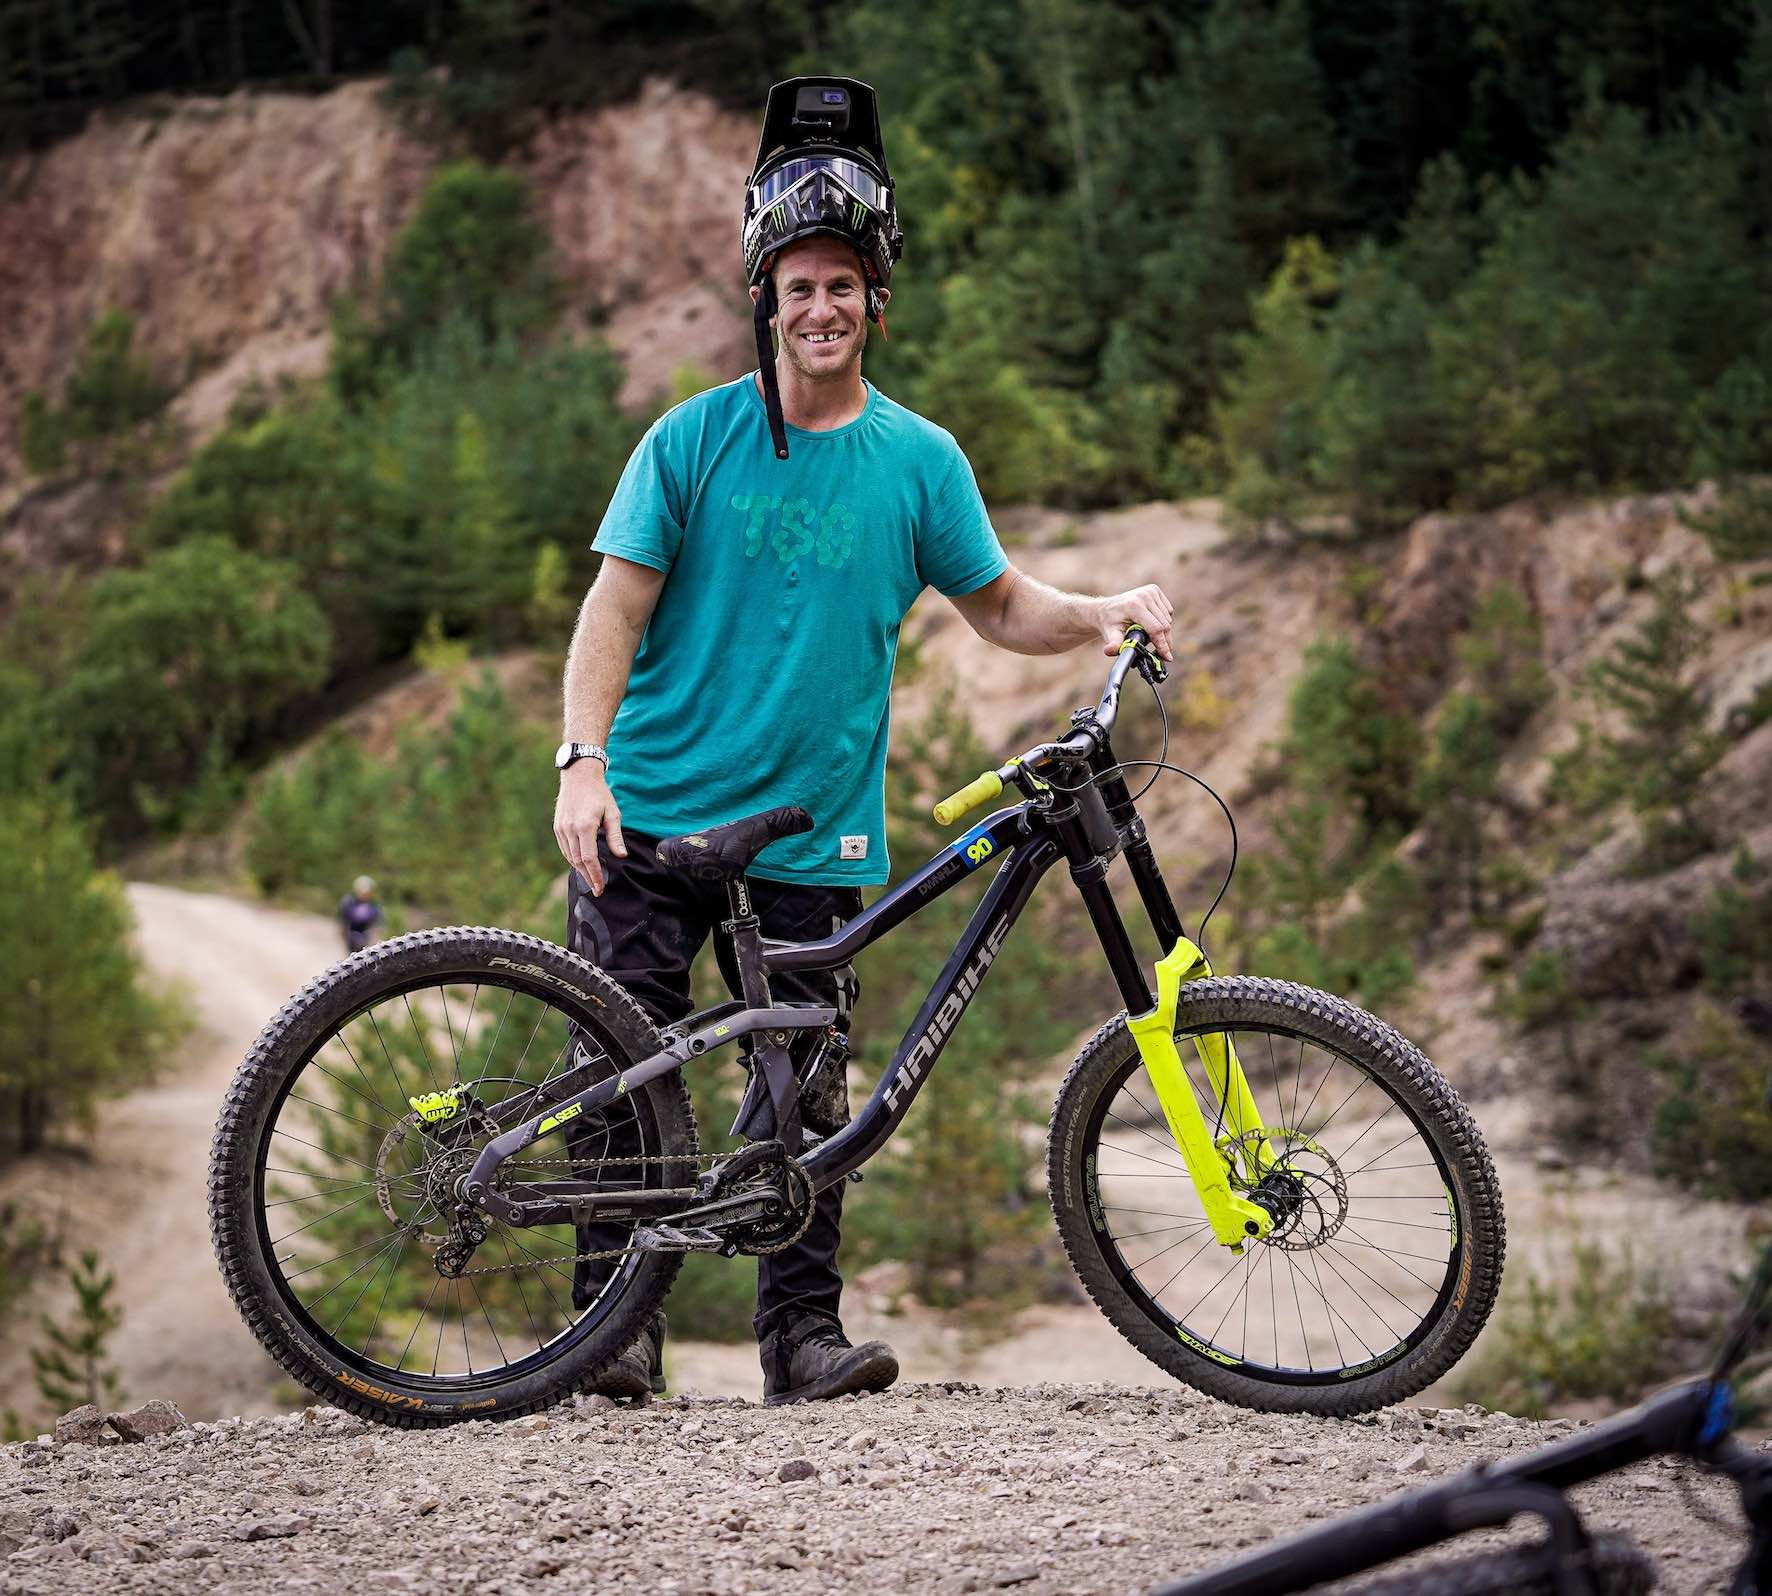 Sam Pilgrim's bike at the 2019 Audi Nines MTB event